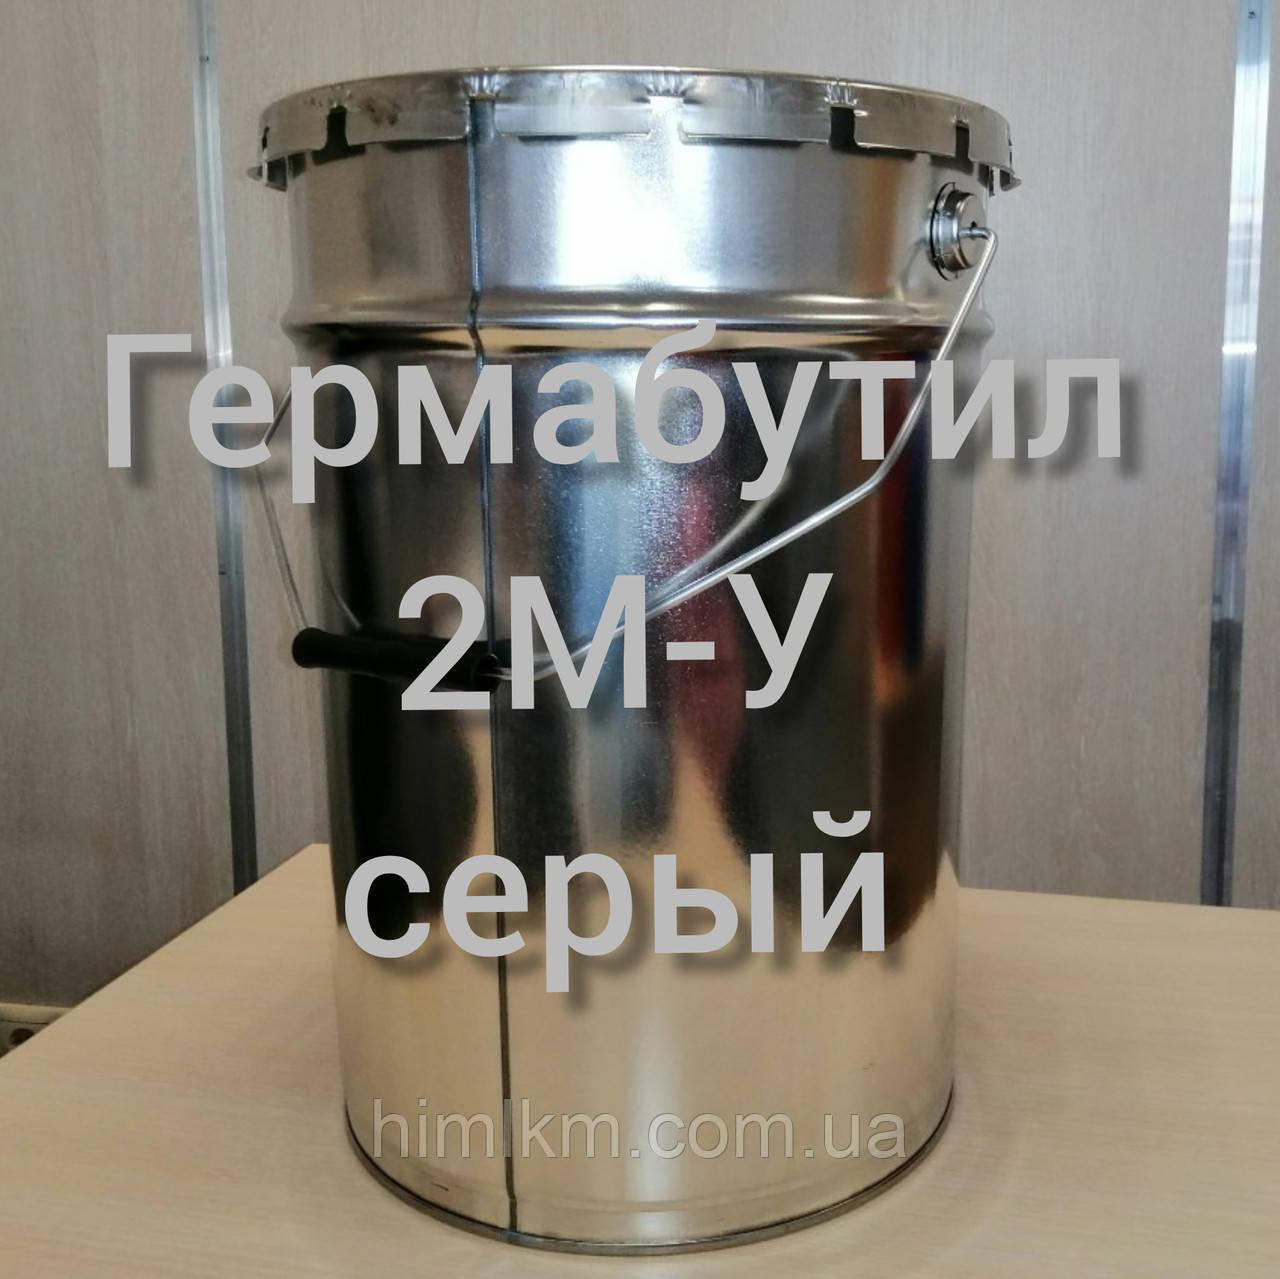 Гермабутил 2М-У, мастика бутилкаучуковая гидроизоляционная Гермабутил 2М